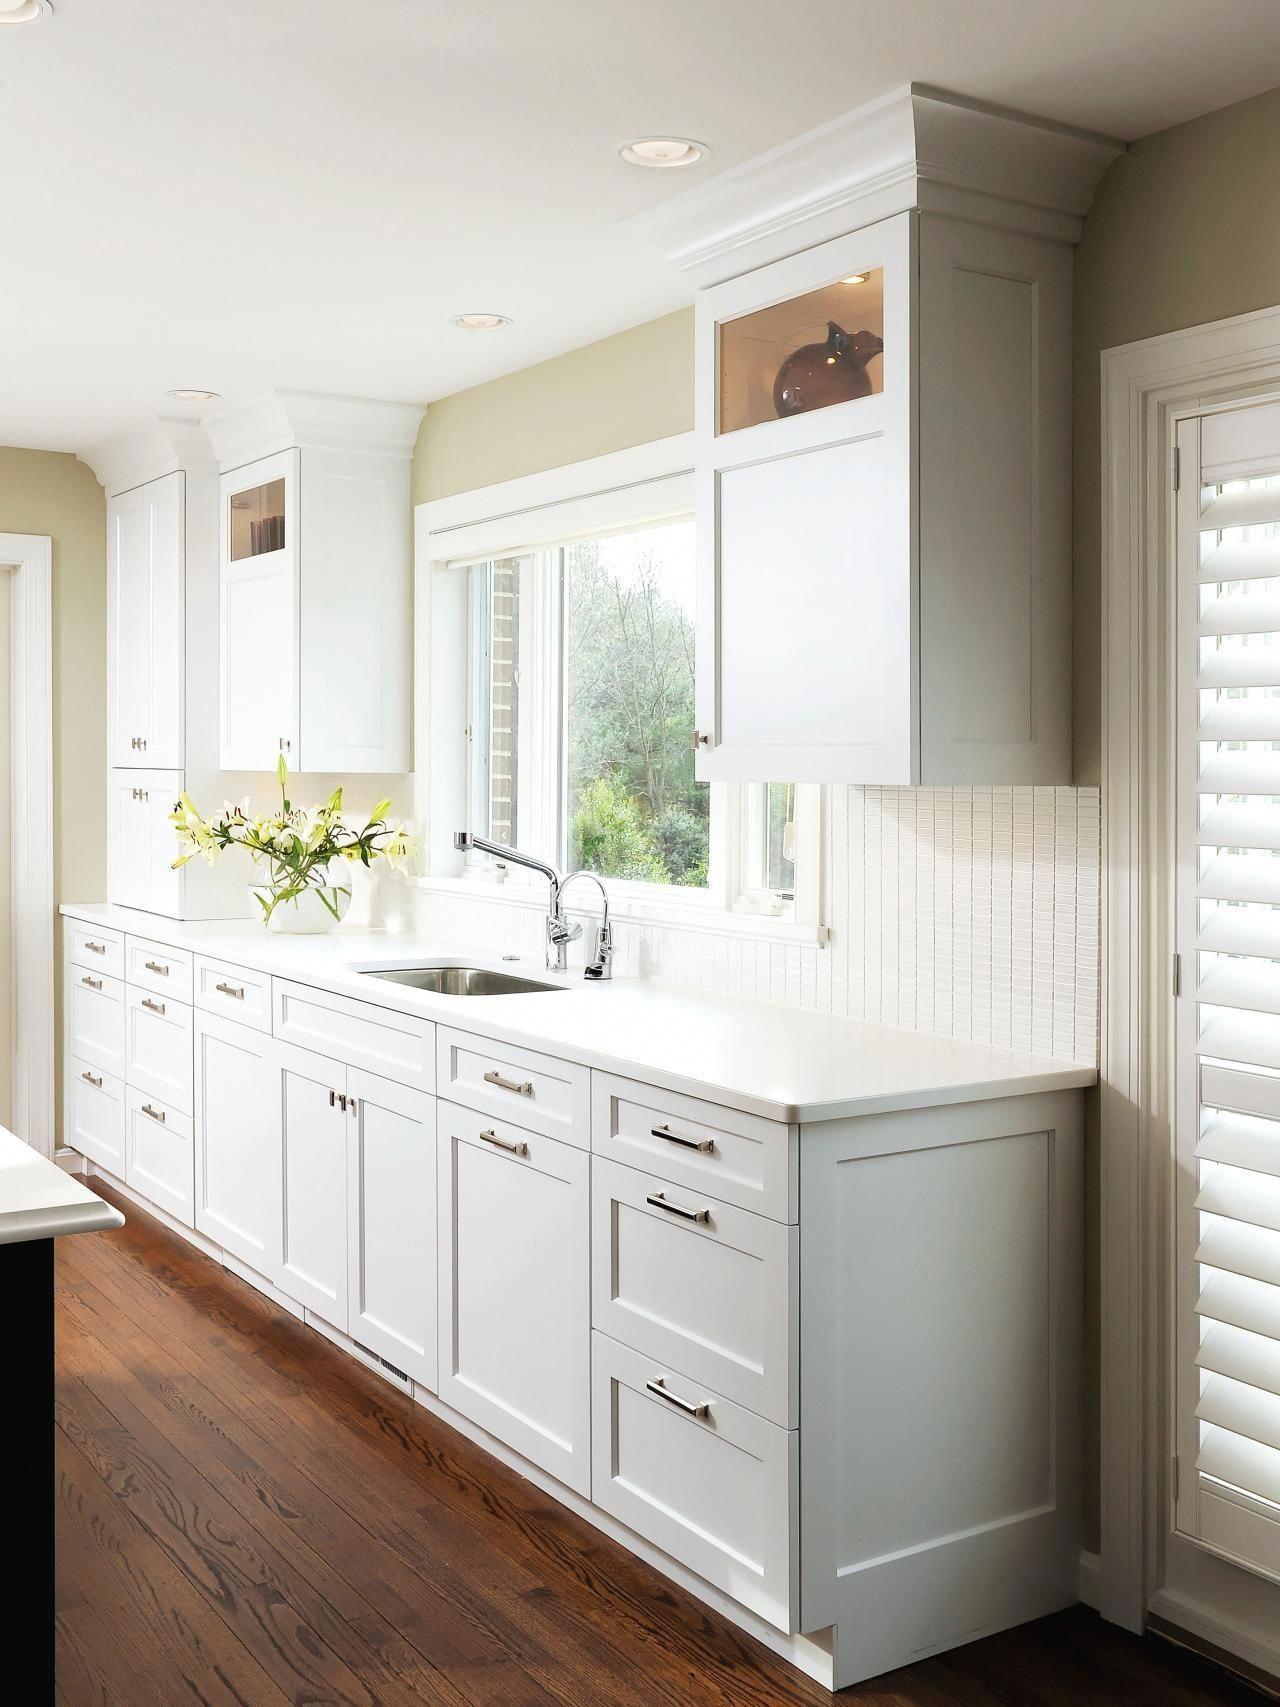 Kitchen Cabinet Refacing Cases Kitchencabinetrefacinglaundryrooms Kitchencab Shaker Style Kitchen Cabinets Kitchen Cabinet Styles Kitchen Cabinet Inspiration